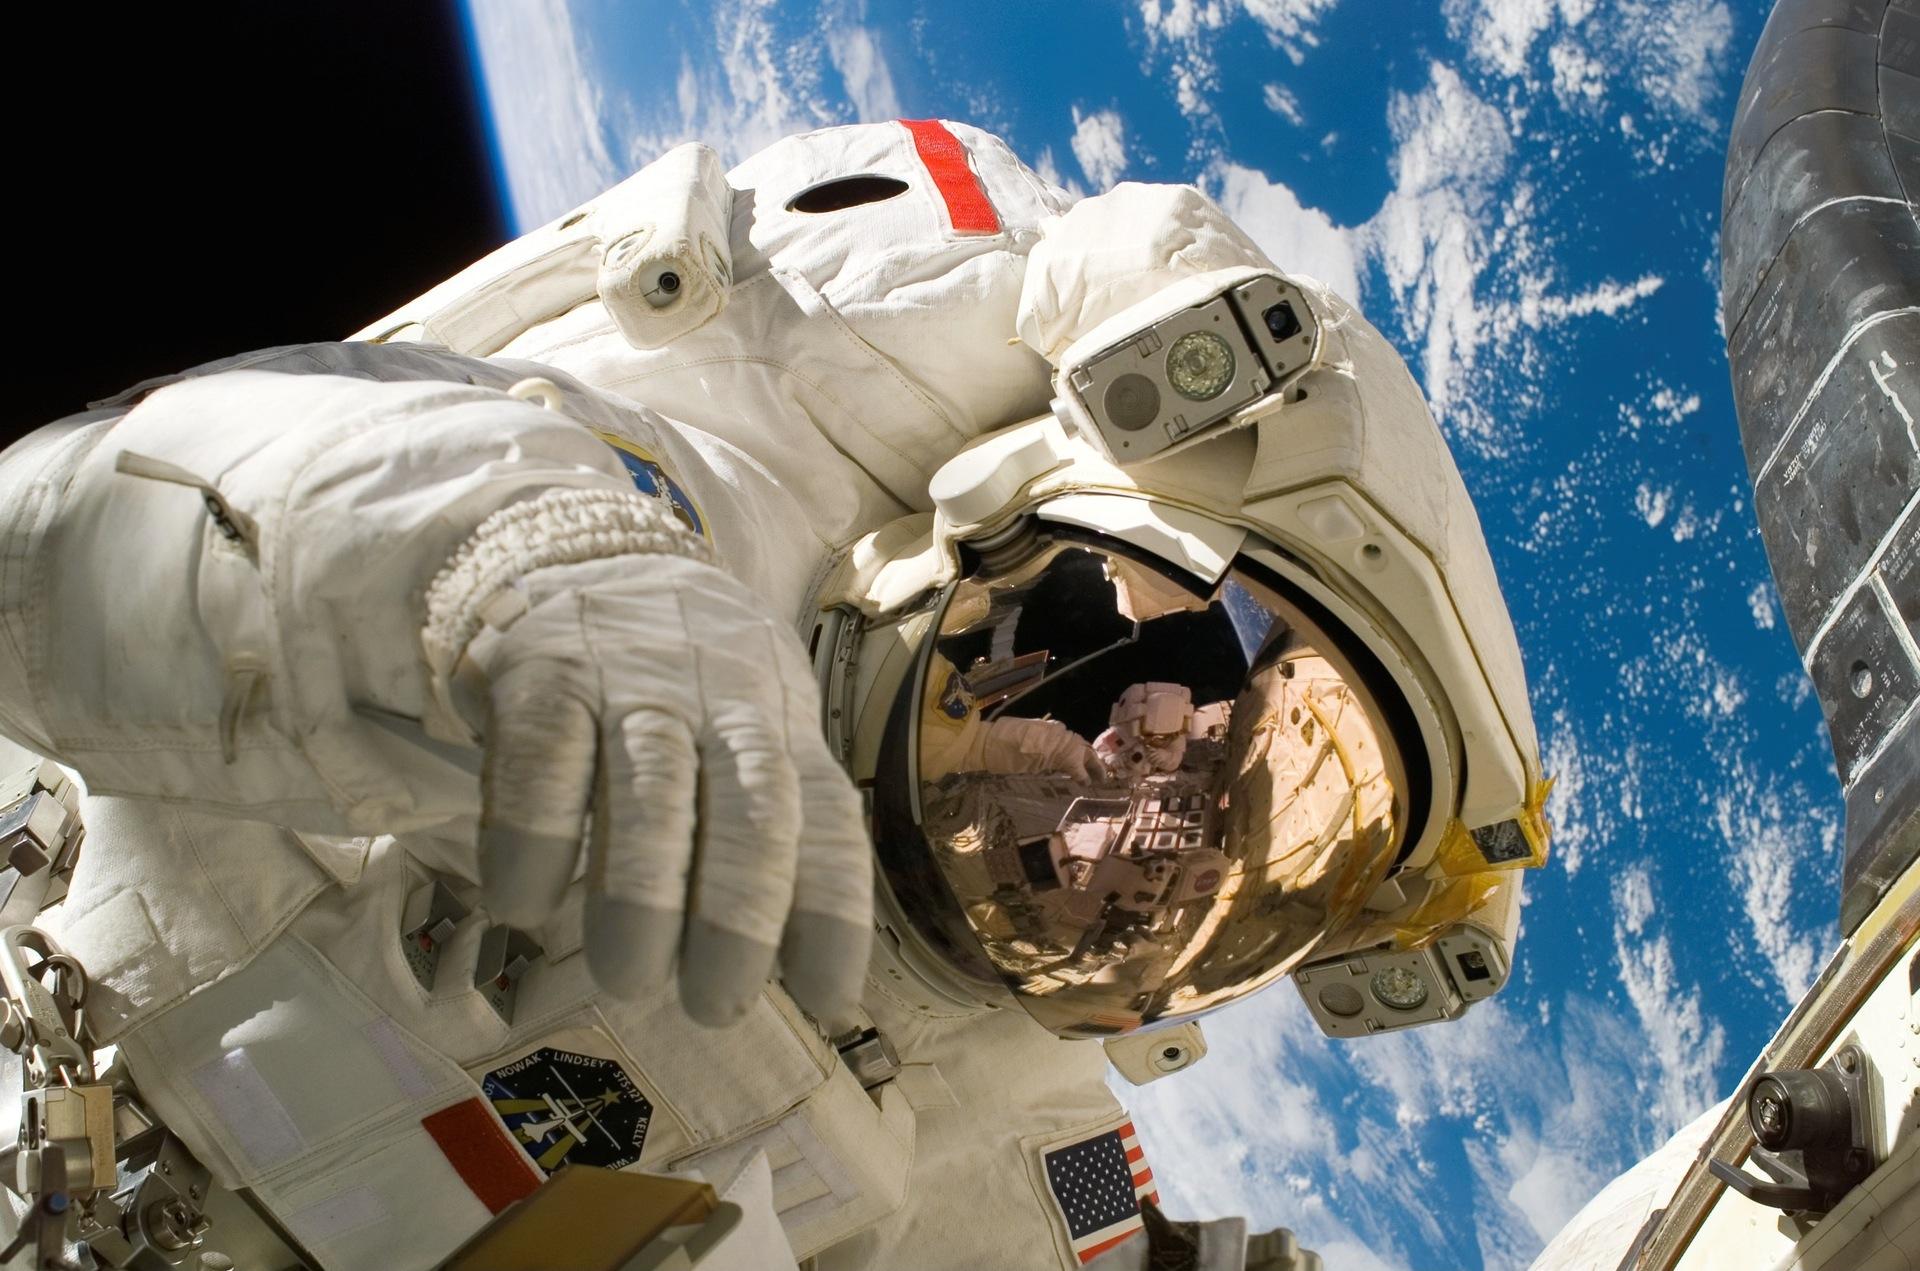 अंतरिक्ष यात्री, पृथ्वी, अंतरिक्ष, अंतरिक्ष सूट, कक्षा - HD वॉलपेपर - प्रोफेसर-falken.com